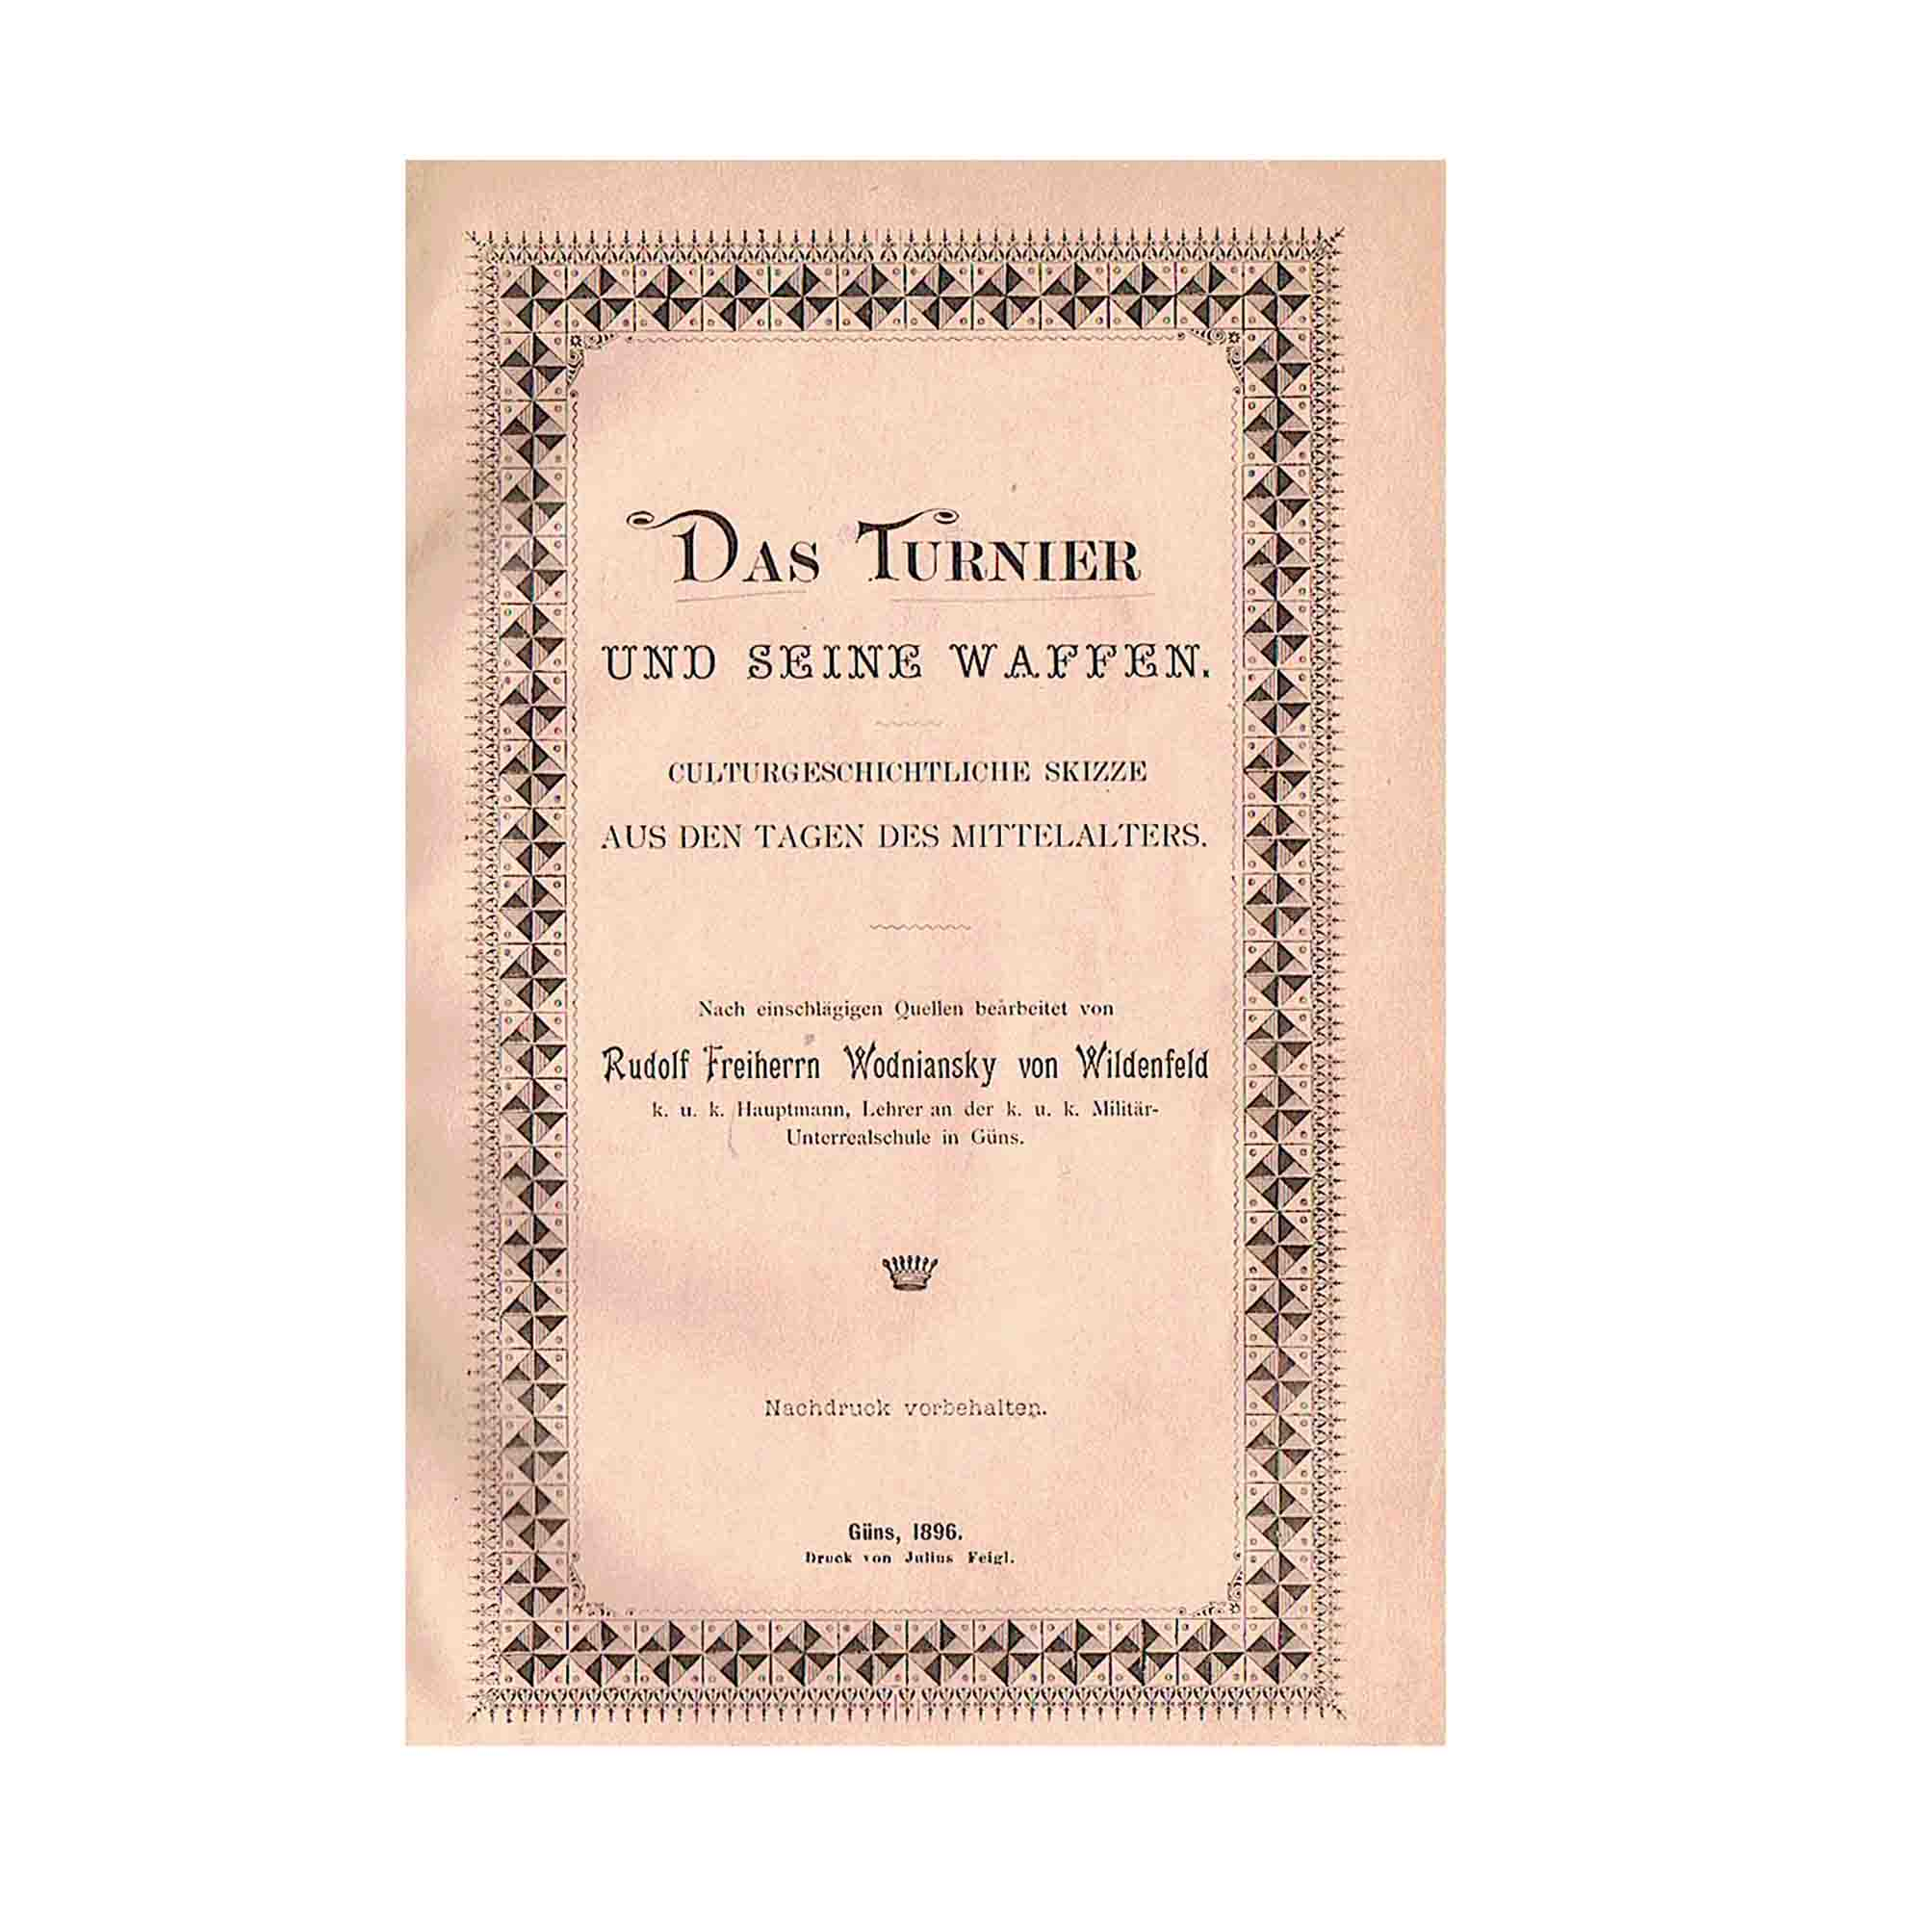 5656-Wodniansky-Turnier-Güns-1896-Titel-N.jpg